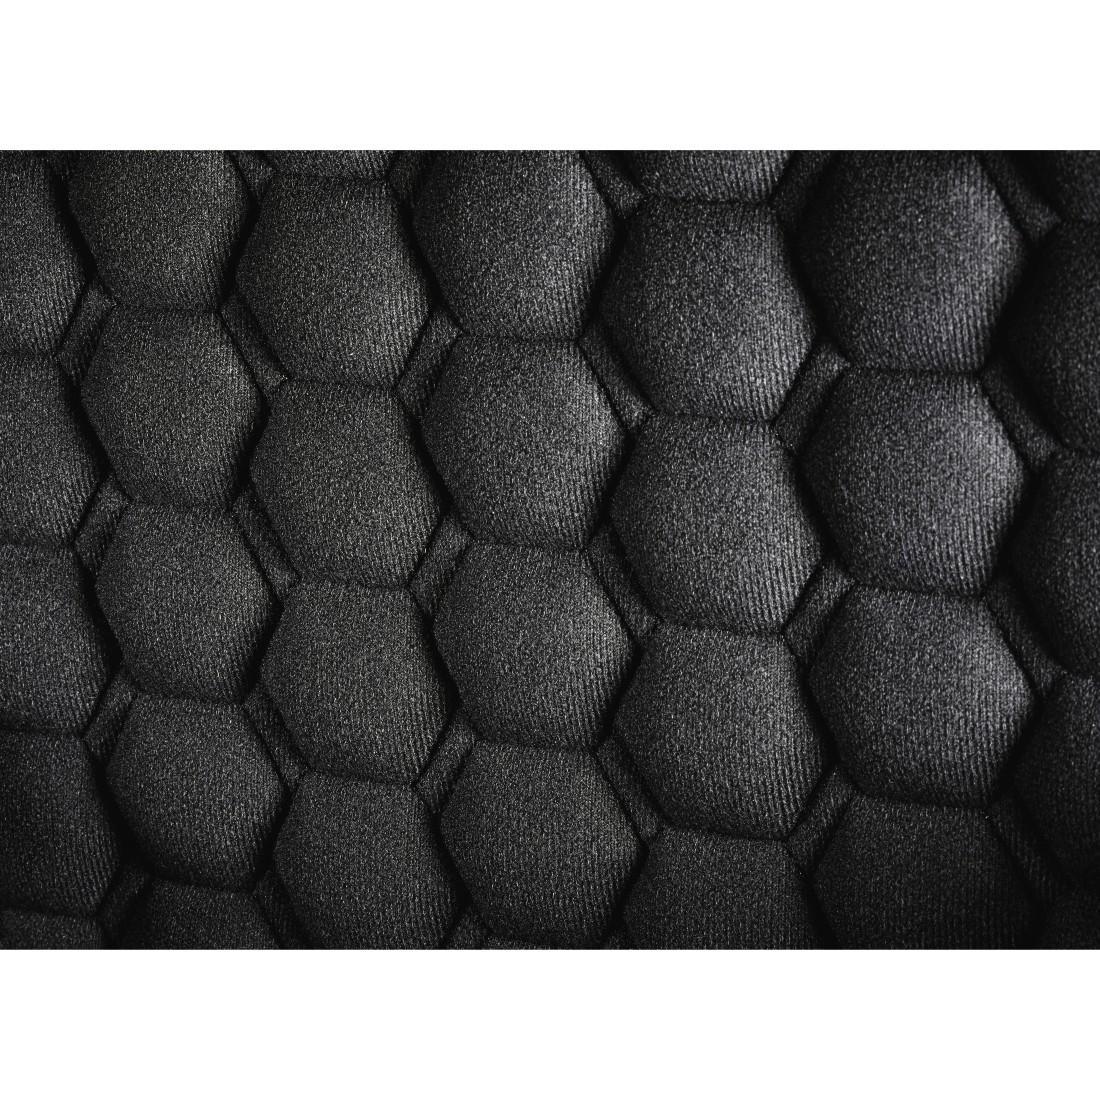 Универсален калъф за лаптоп HAMA Protection, до 34 см  (13.3),  удароустойчив, пластмасов, Черен-4